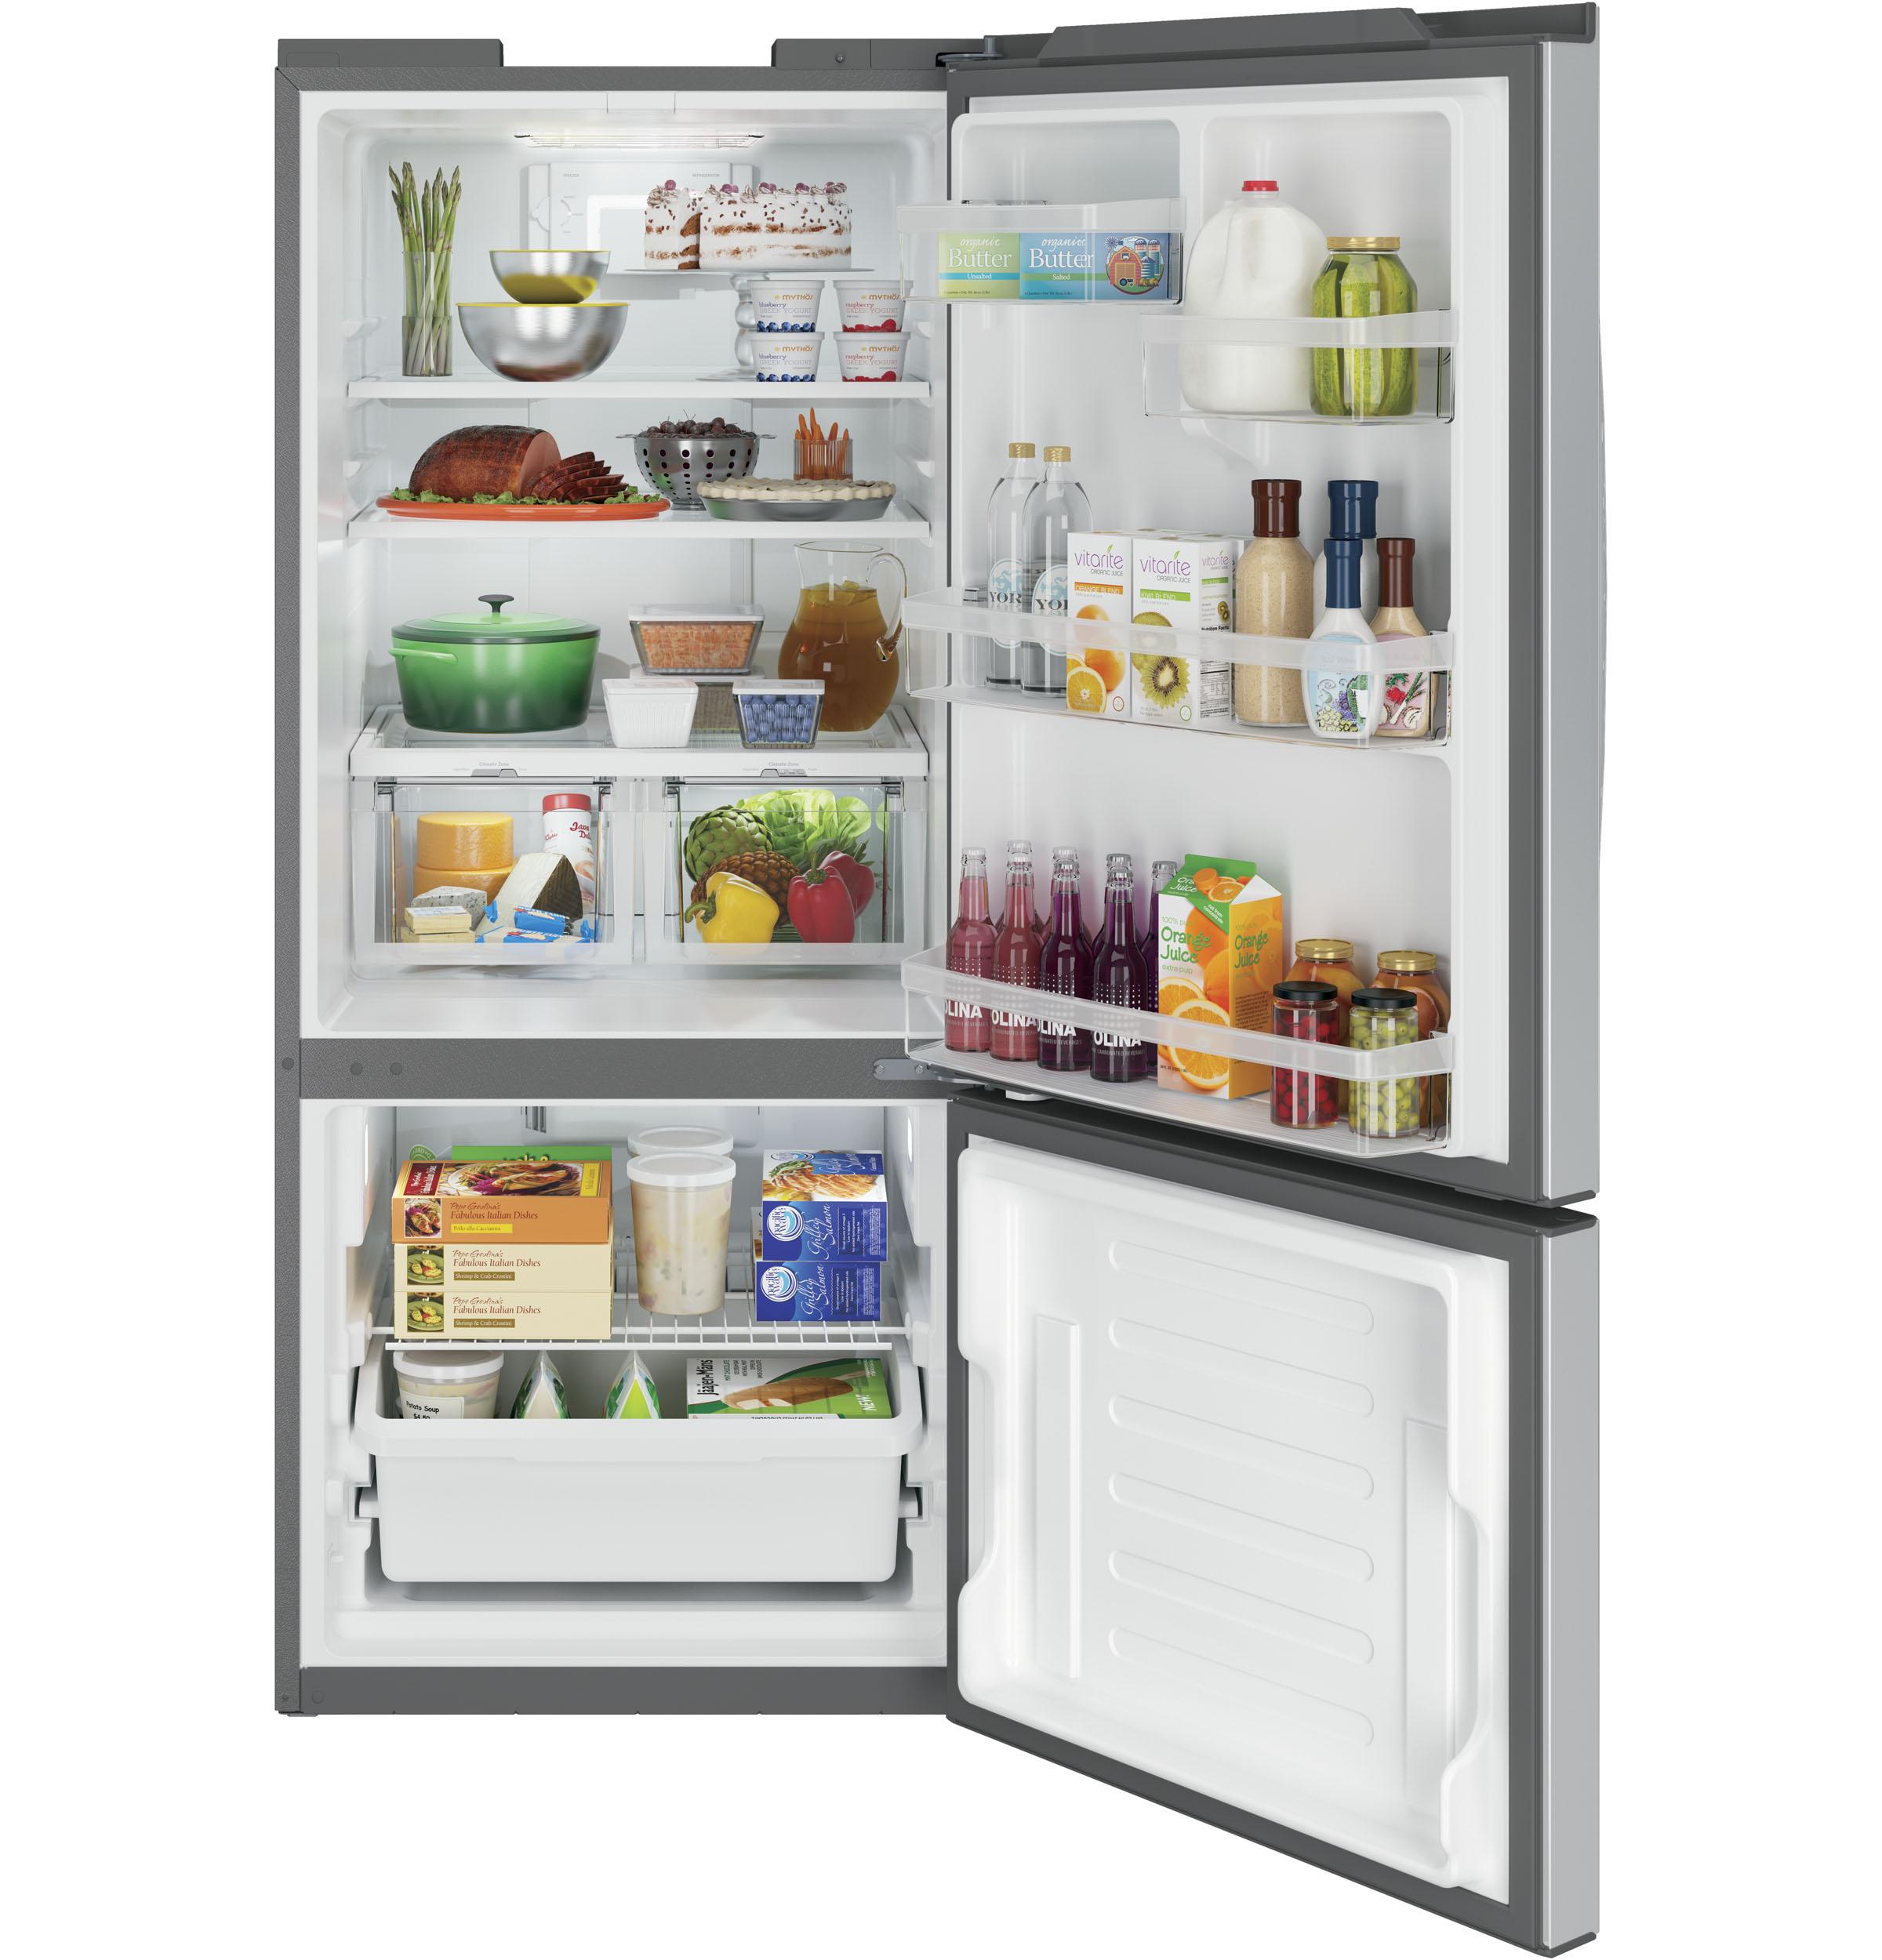 GE Appliances GBE21DSKSS 20.9 cu. ft. Single Door Bottom Freezer Refrigerator - Stainless Steel